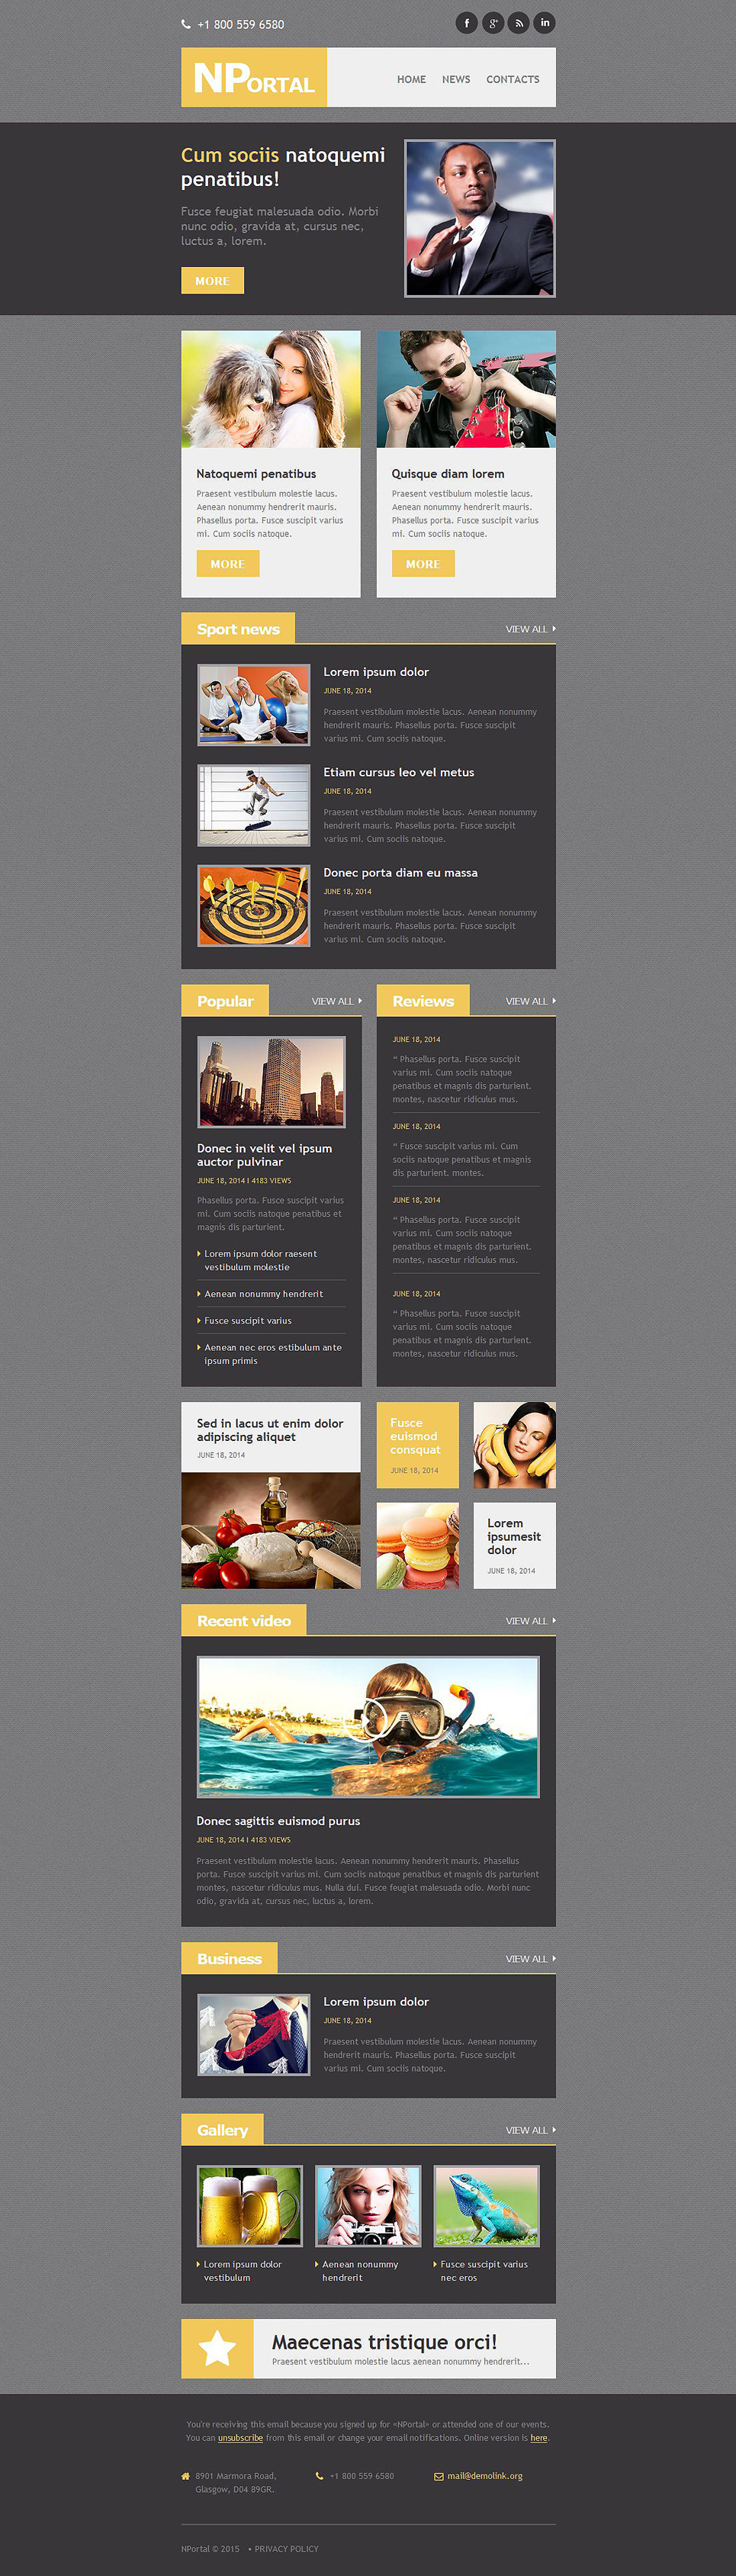 News Portal Responsive Newsletter Template #52812